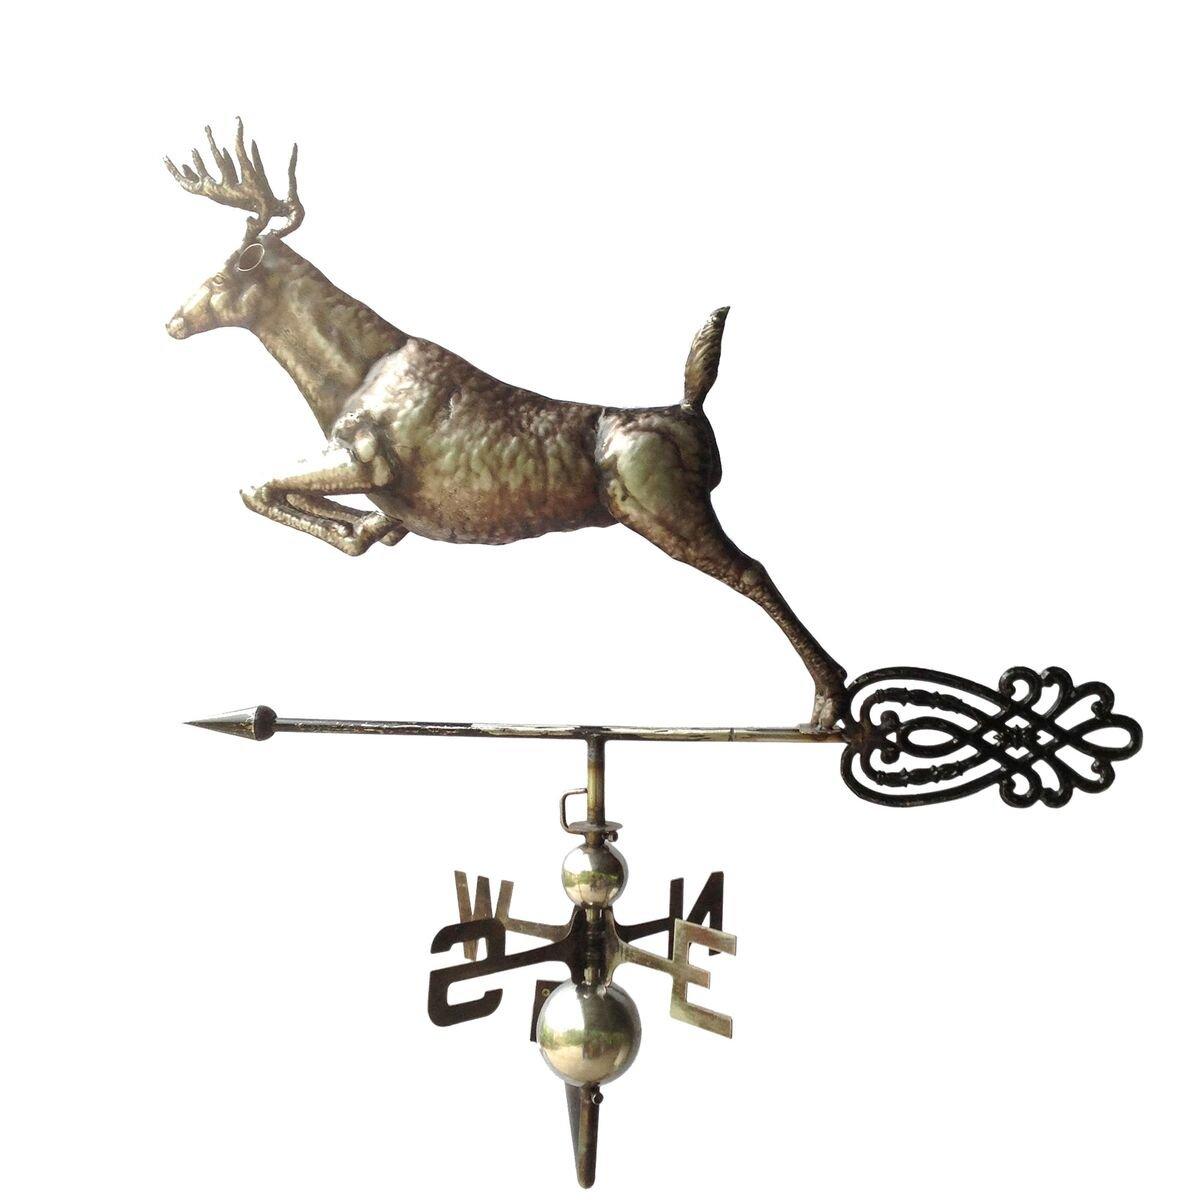 Backyard Expressions 910129 100% Steel Leaping Deer Weathervane, Medium, Silver